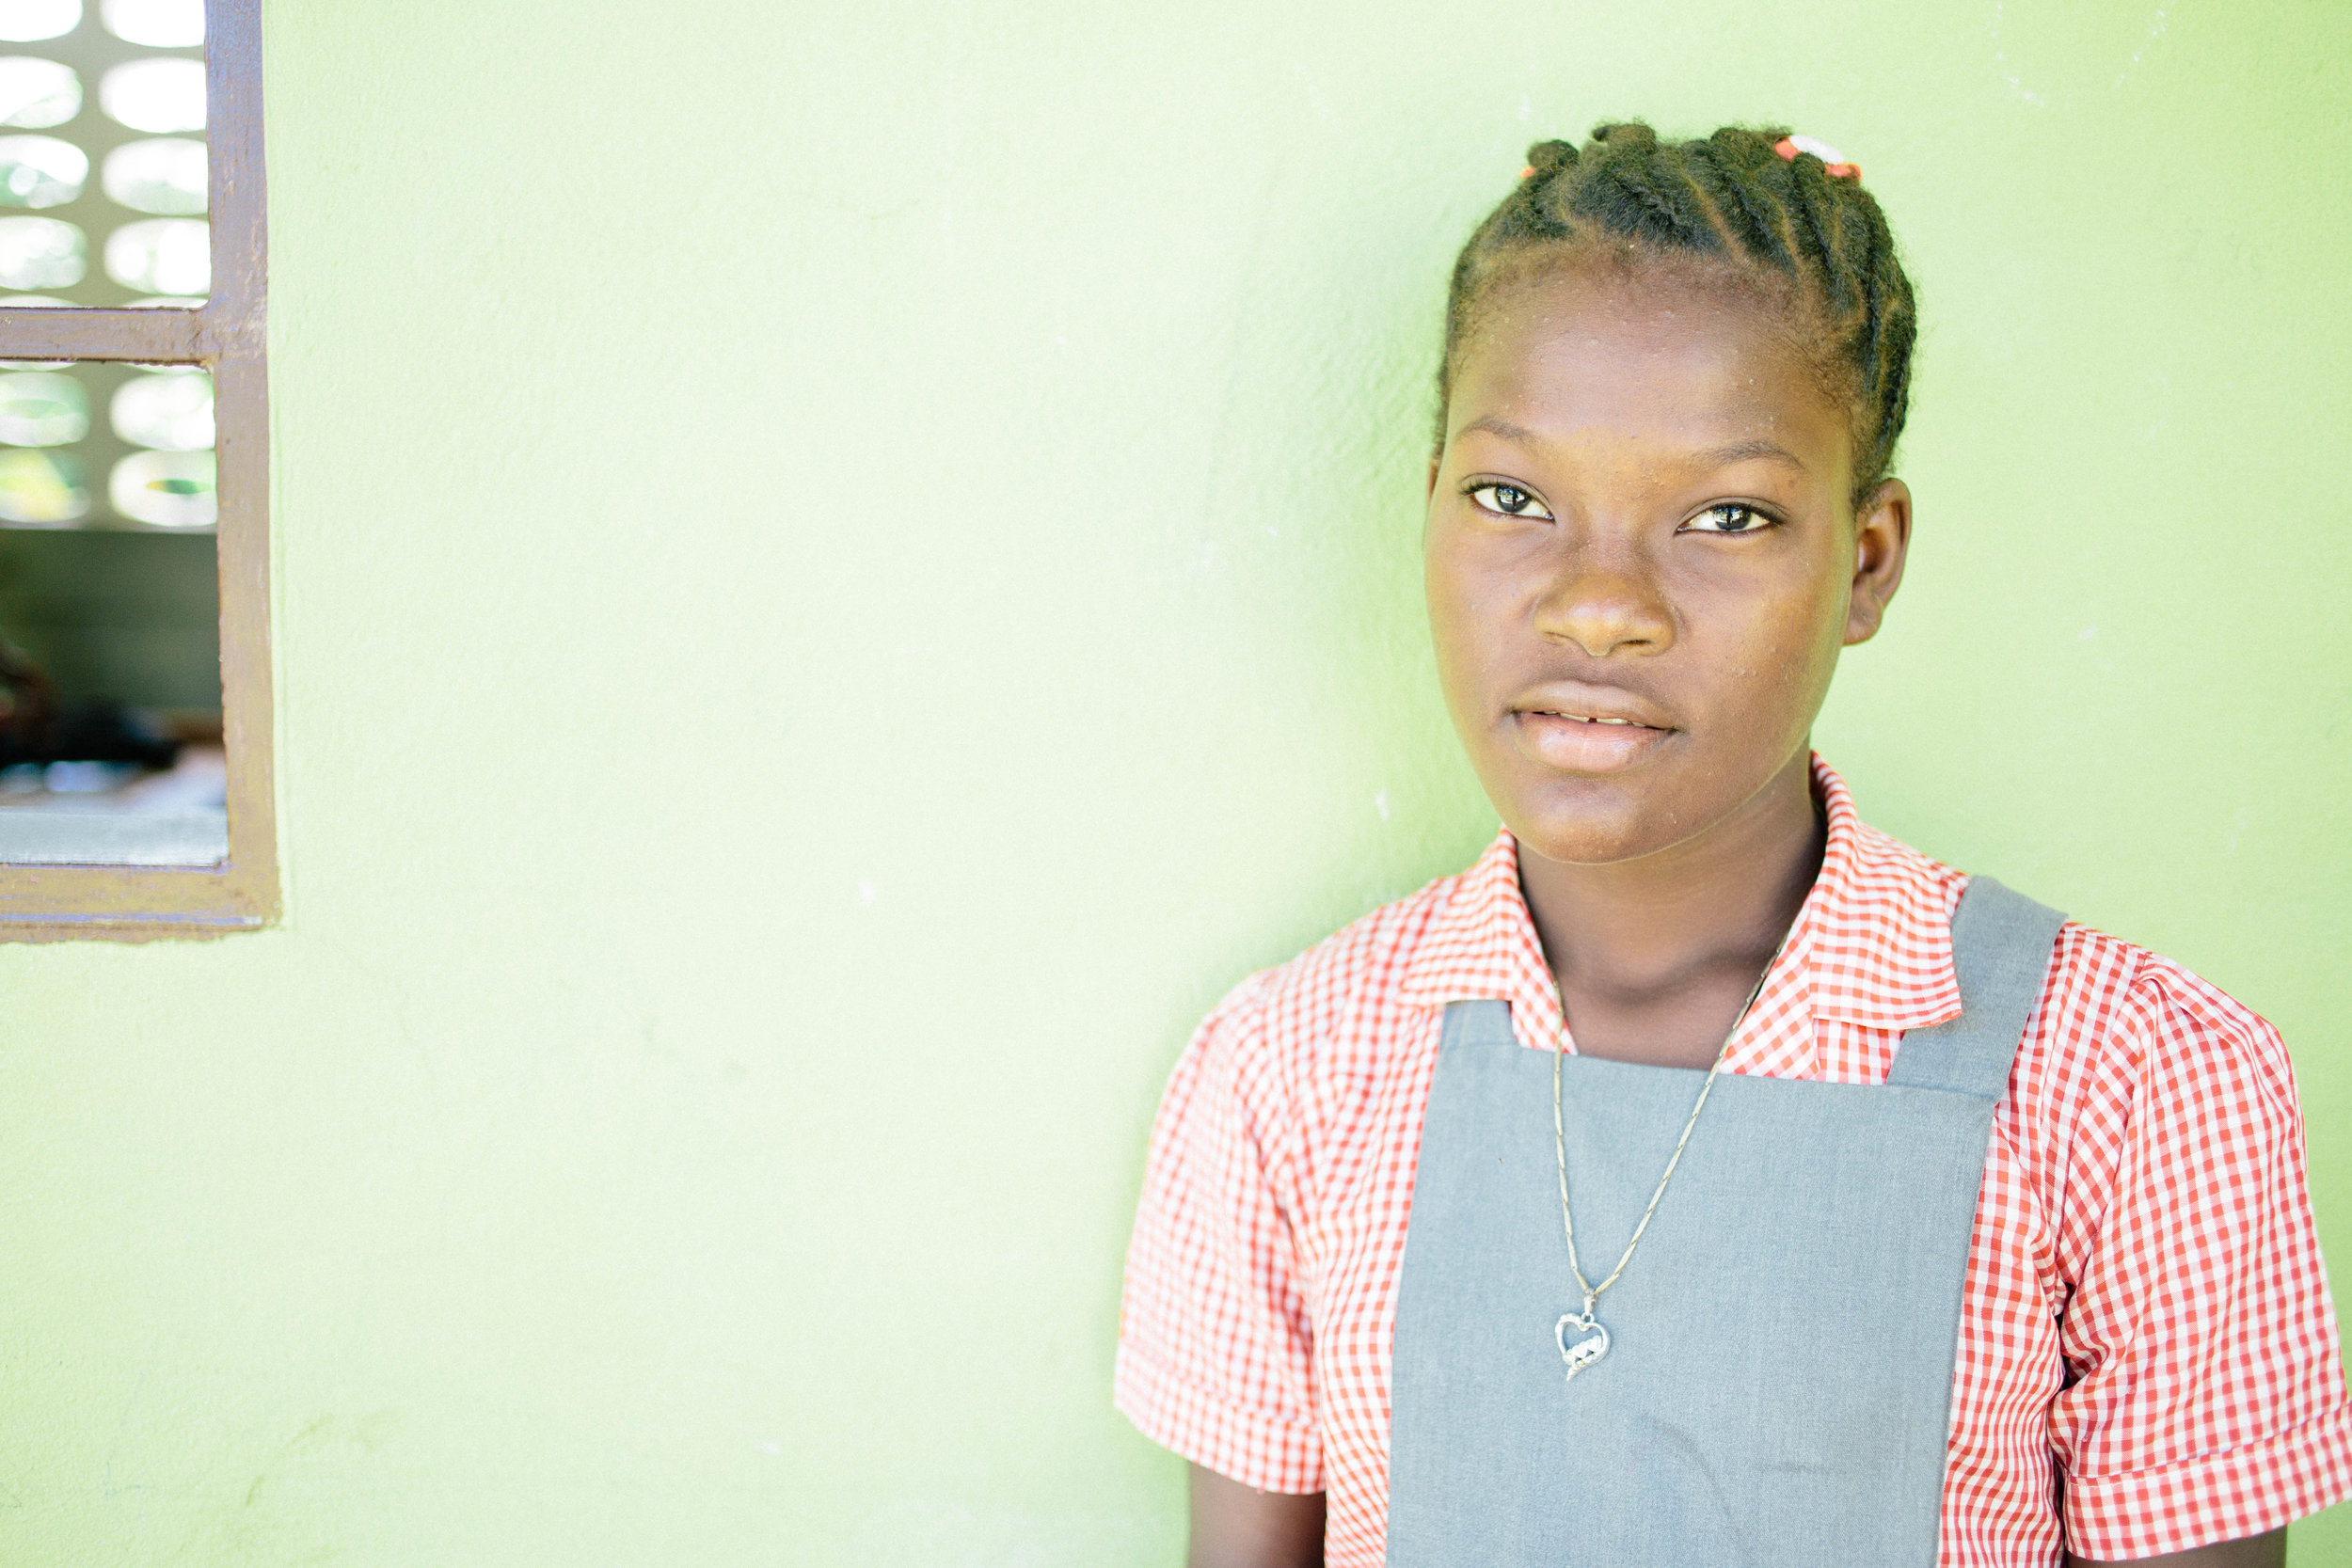 Changemaker: Jessika, The Diplomat